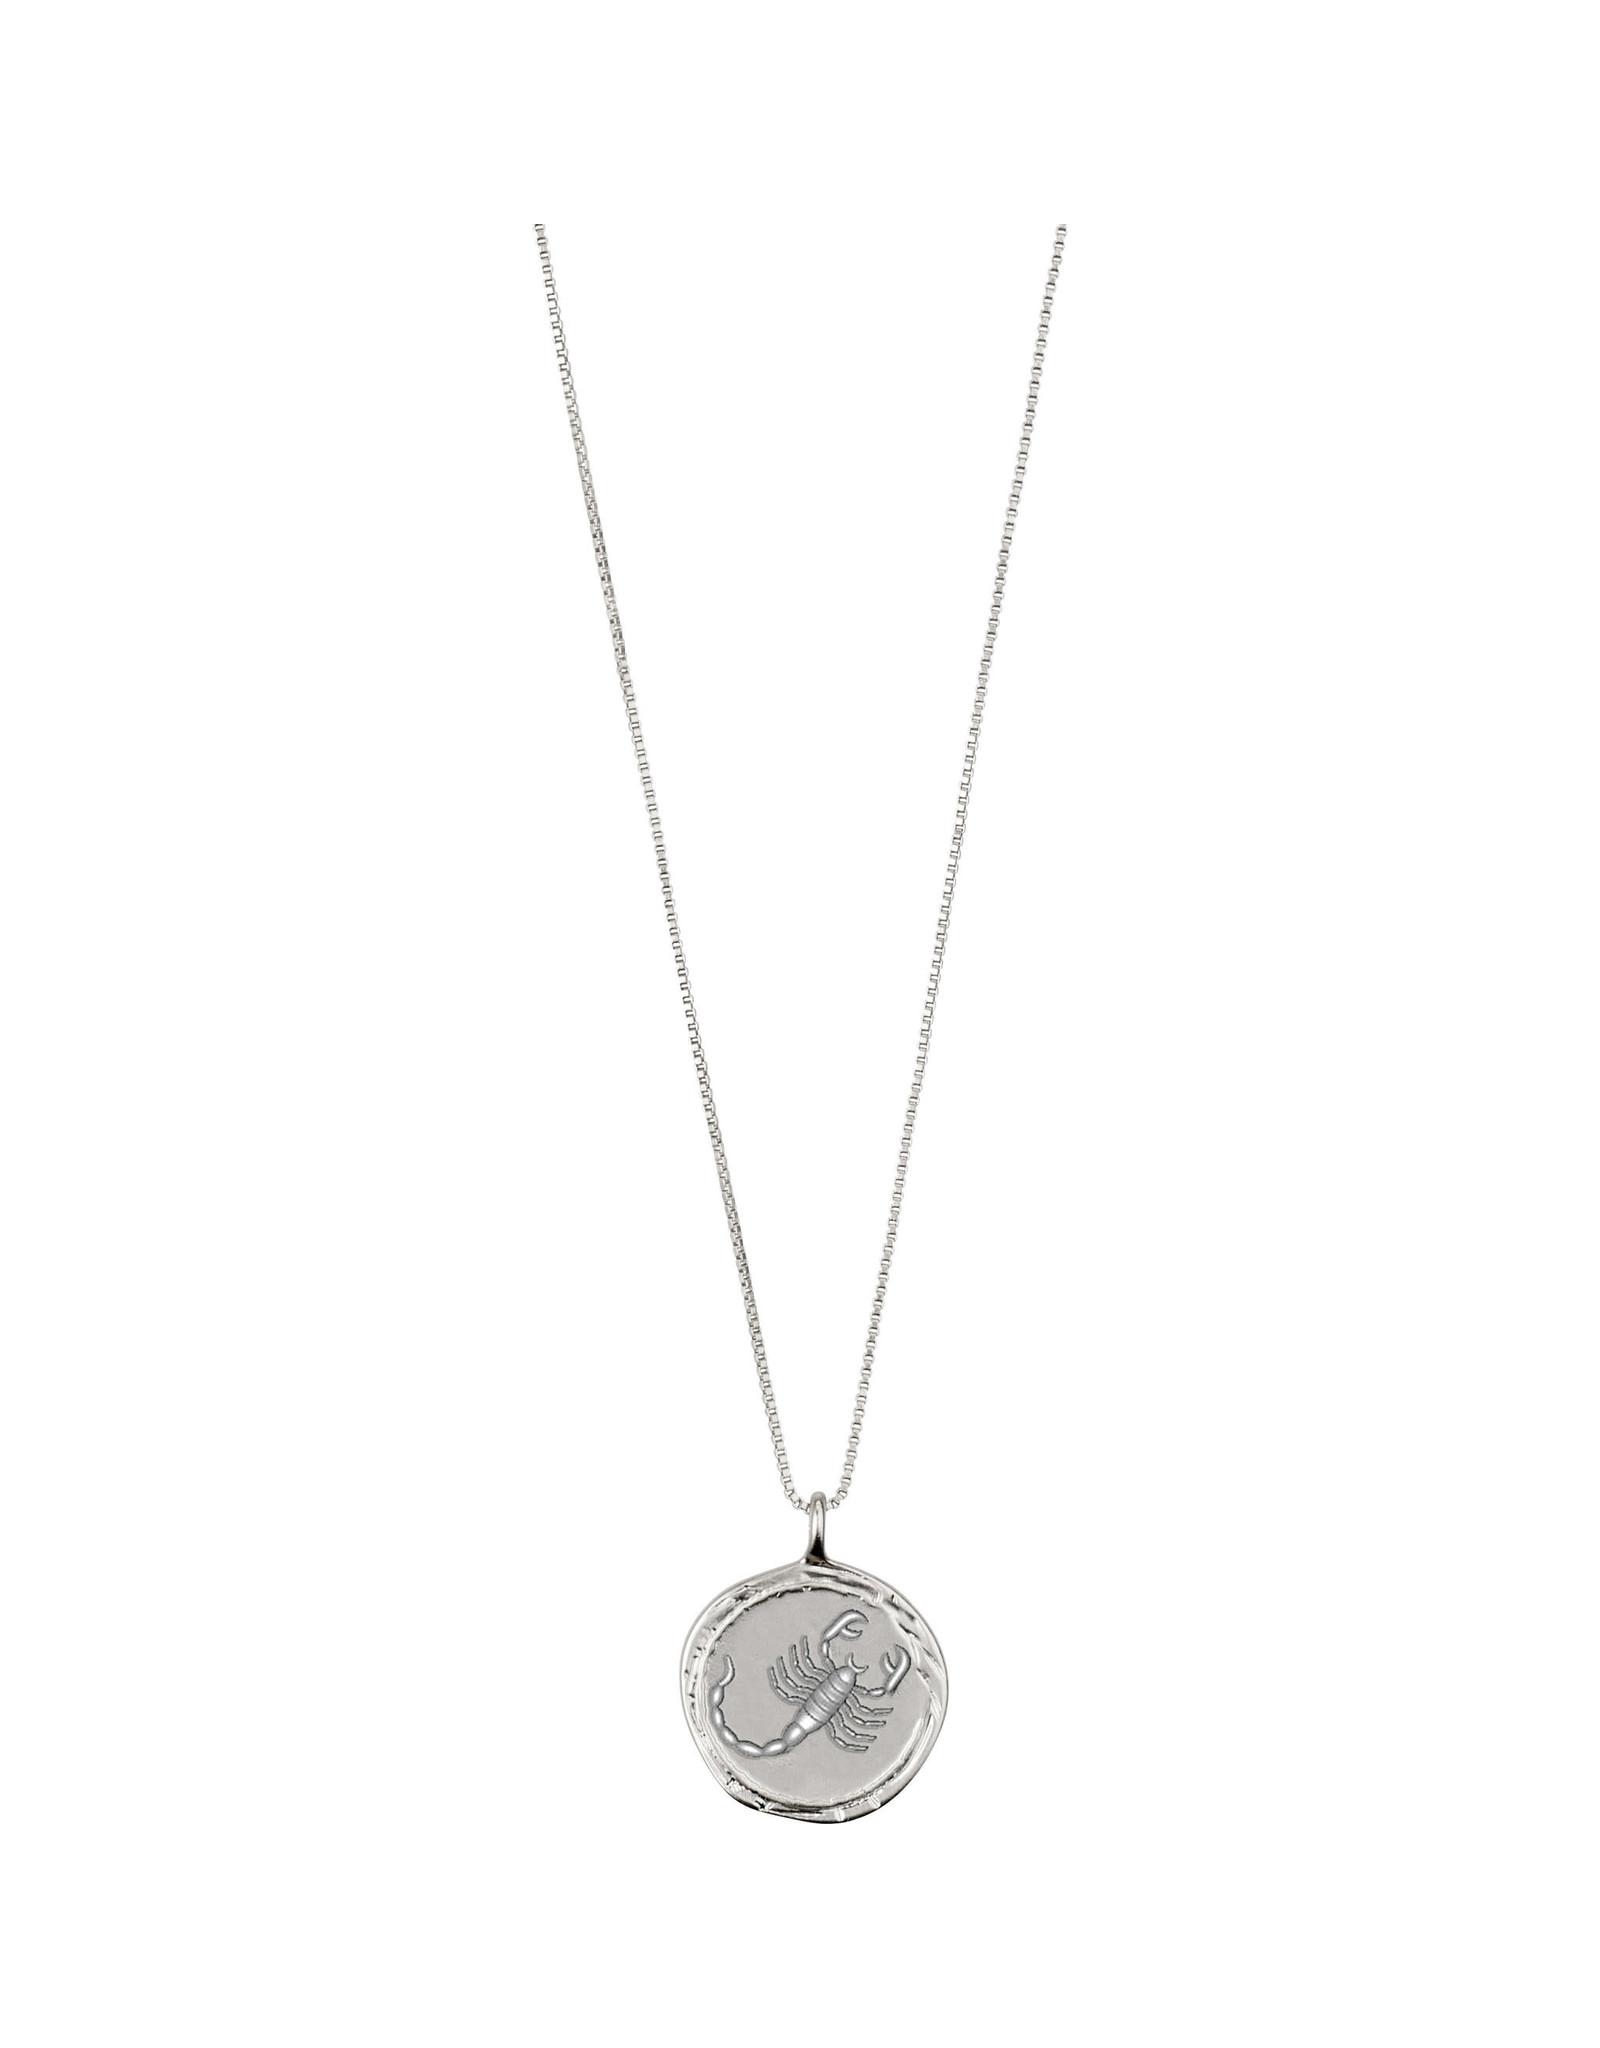 Pilgrim Necklace Scorpio Zodiac Sign, Crystal, Silver